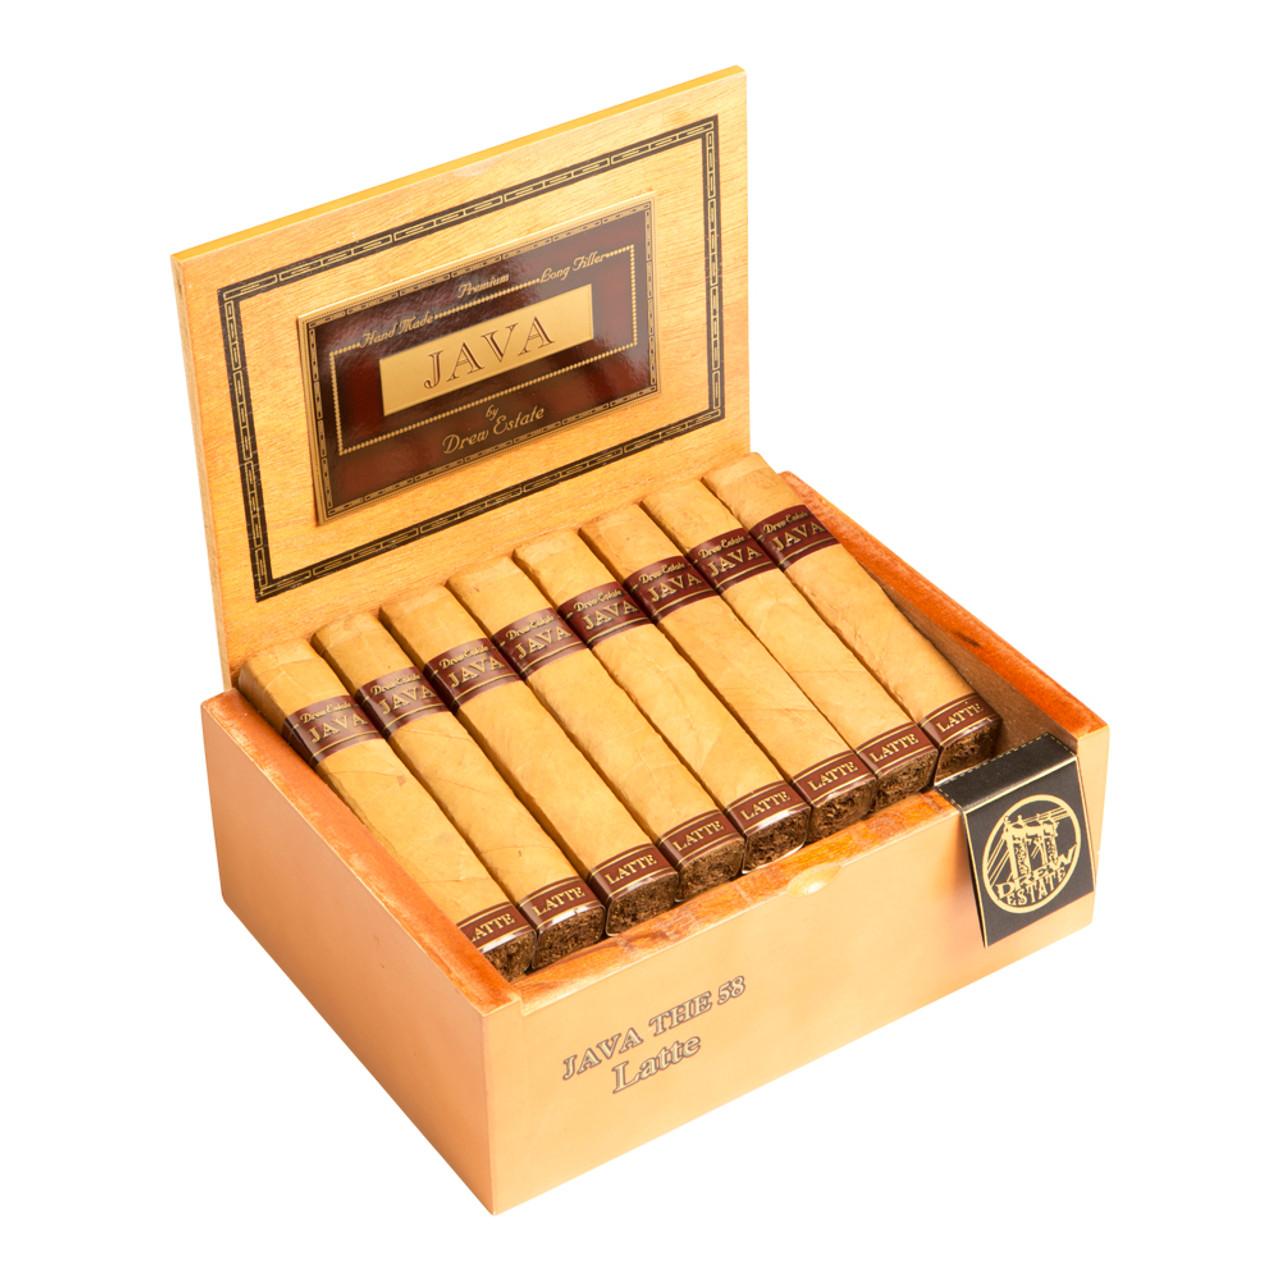 Rocky Patel Java Latte Petite Corona Cigars - 4.5 x 38 (Box of 40)